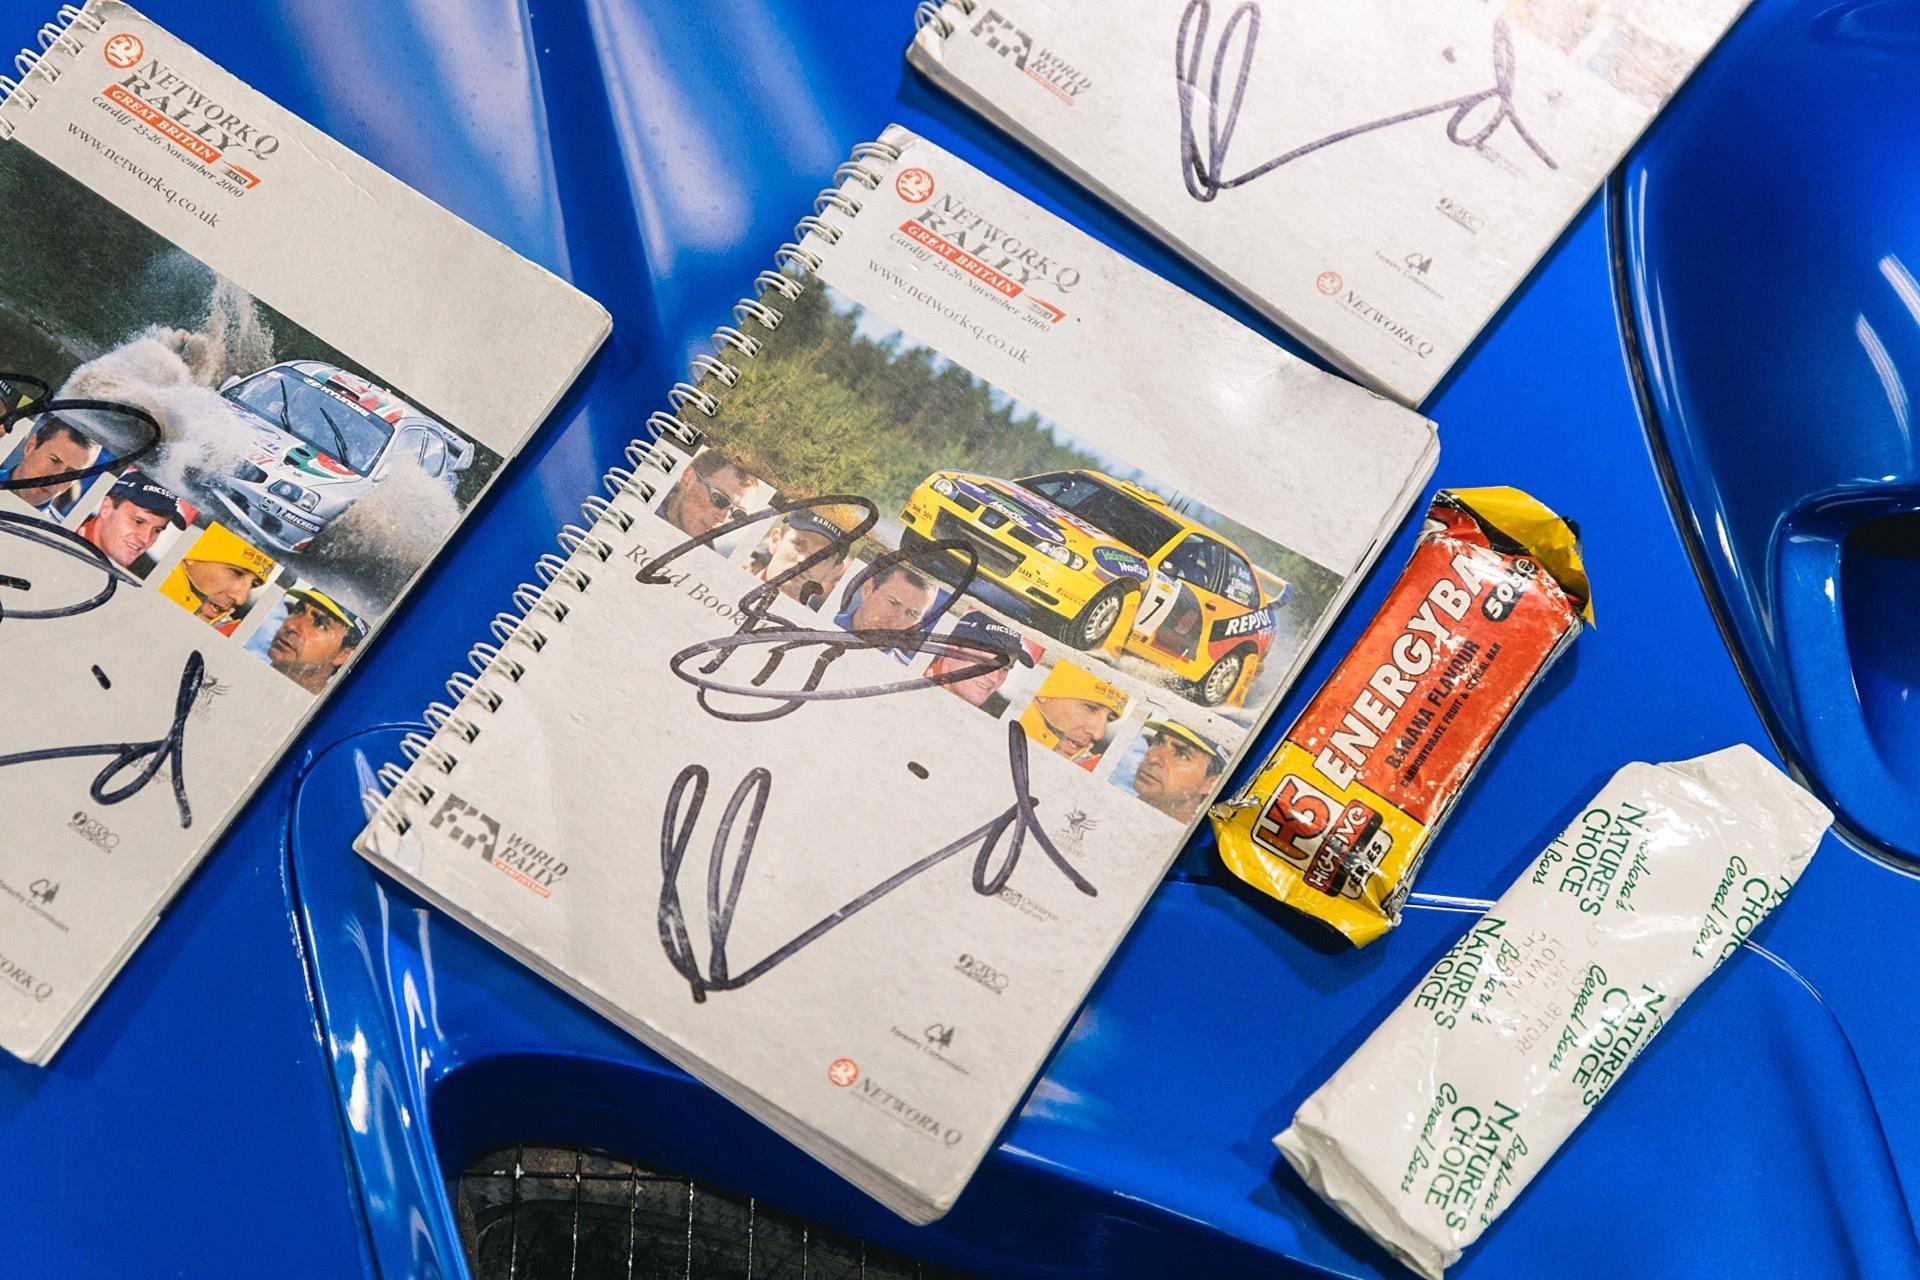 Richard_Burns_Subaru_Impreza_WRC_sale-0004